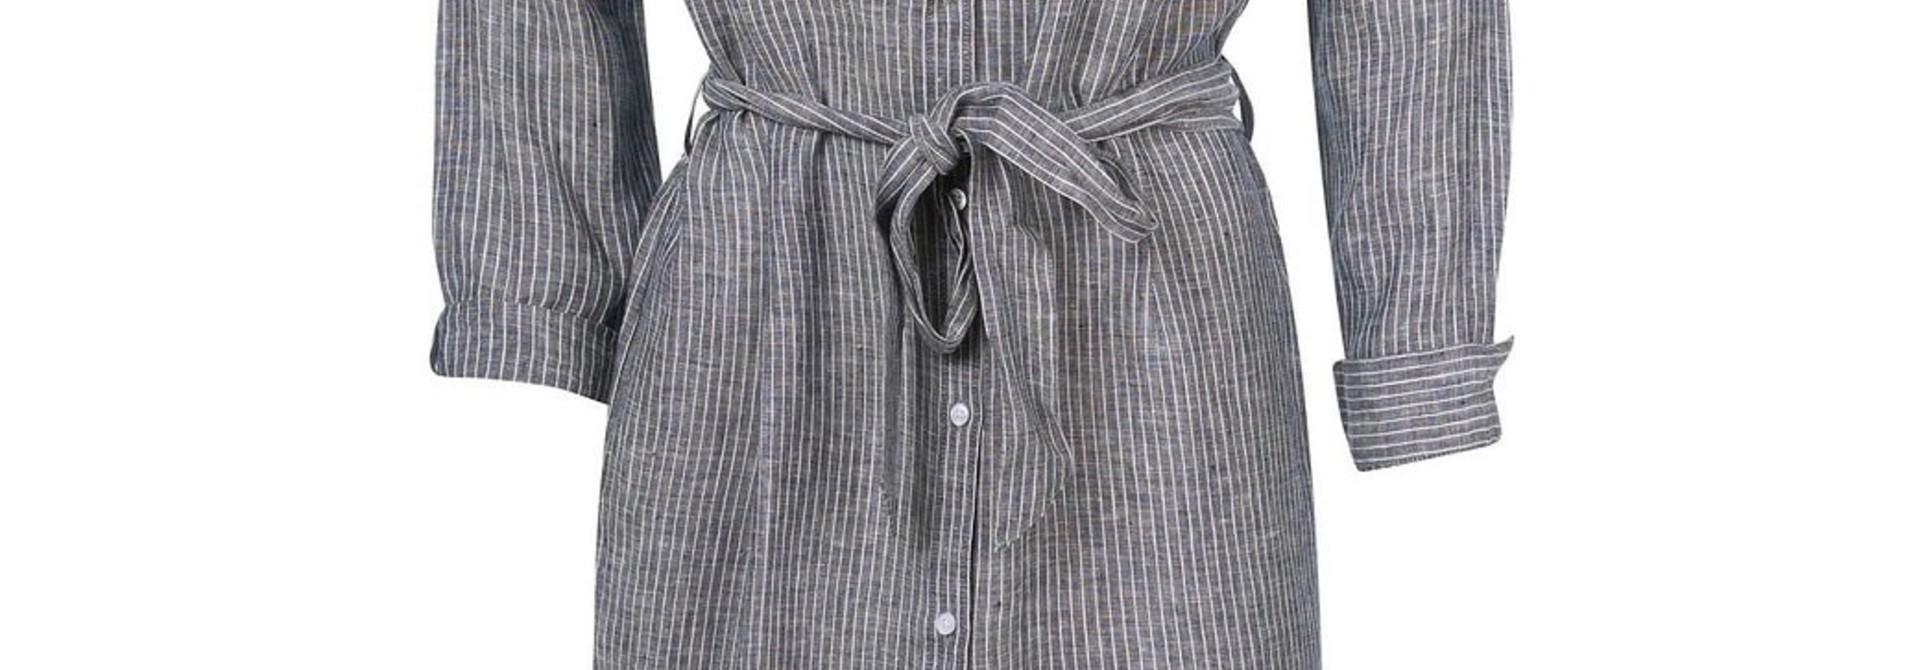 Barbour Tern Dress Navy